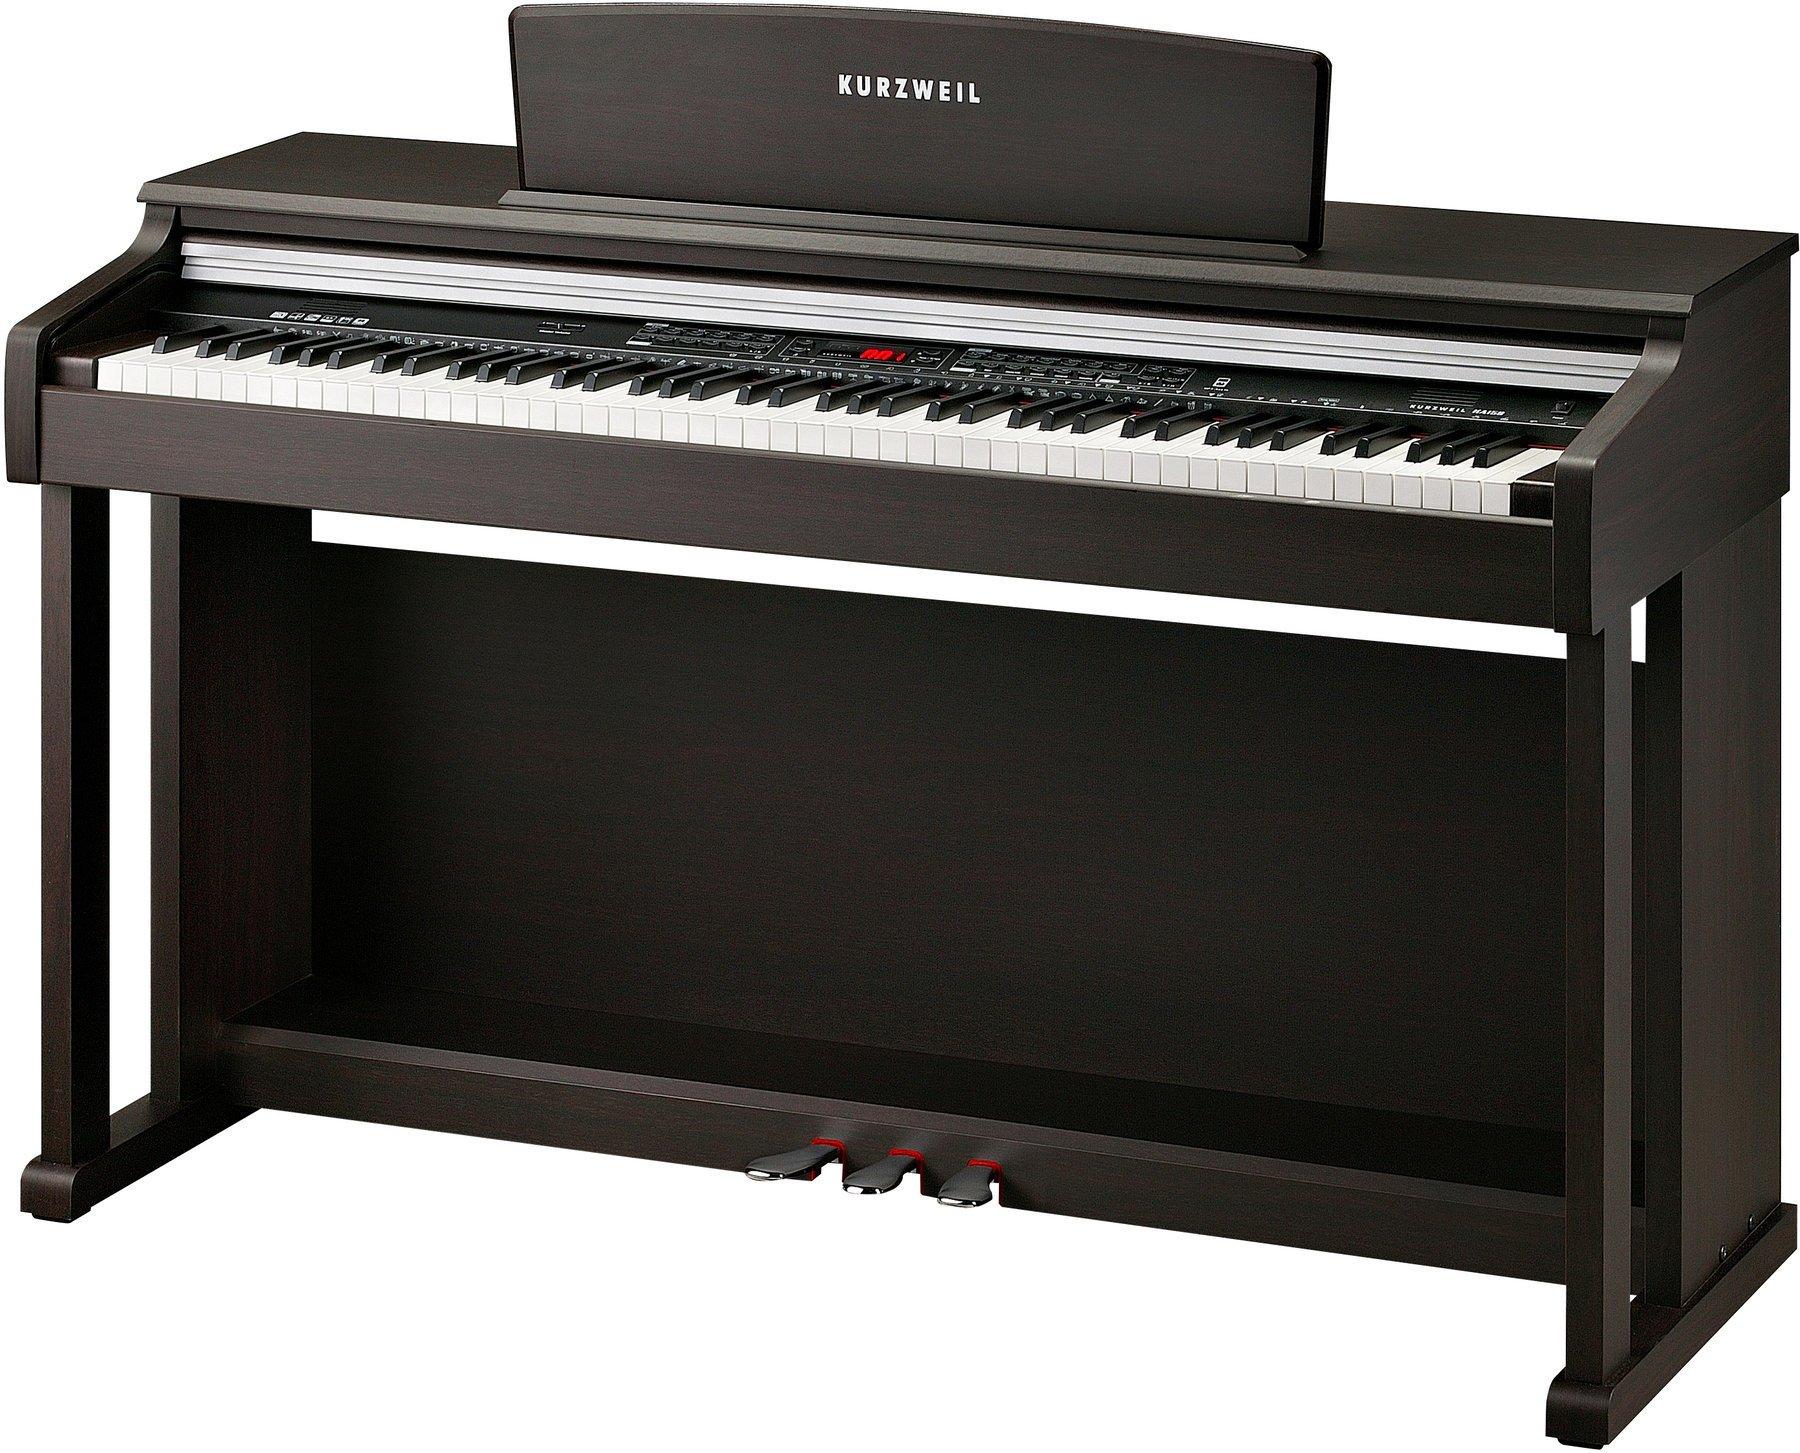 Kurzweil KA150 Simulated Rosewood Digitální piano